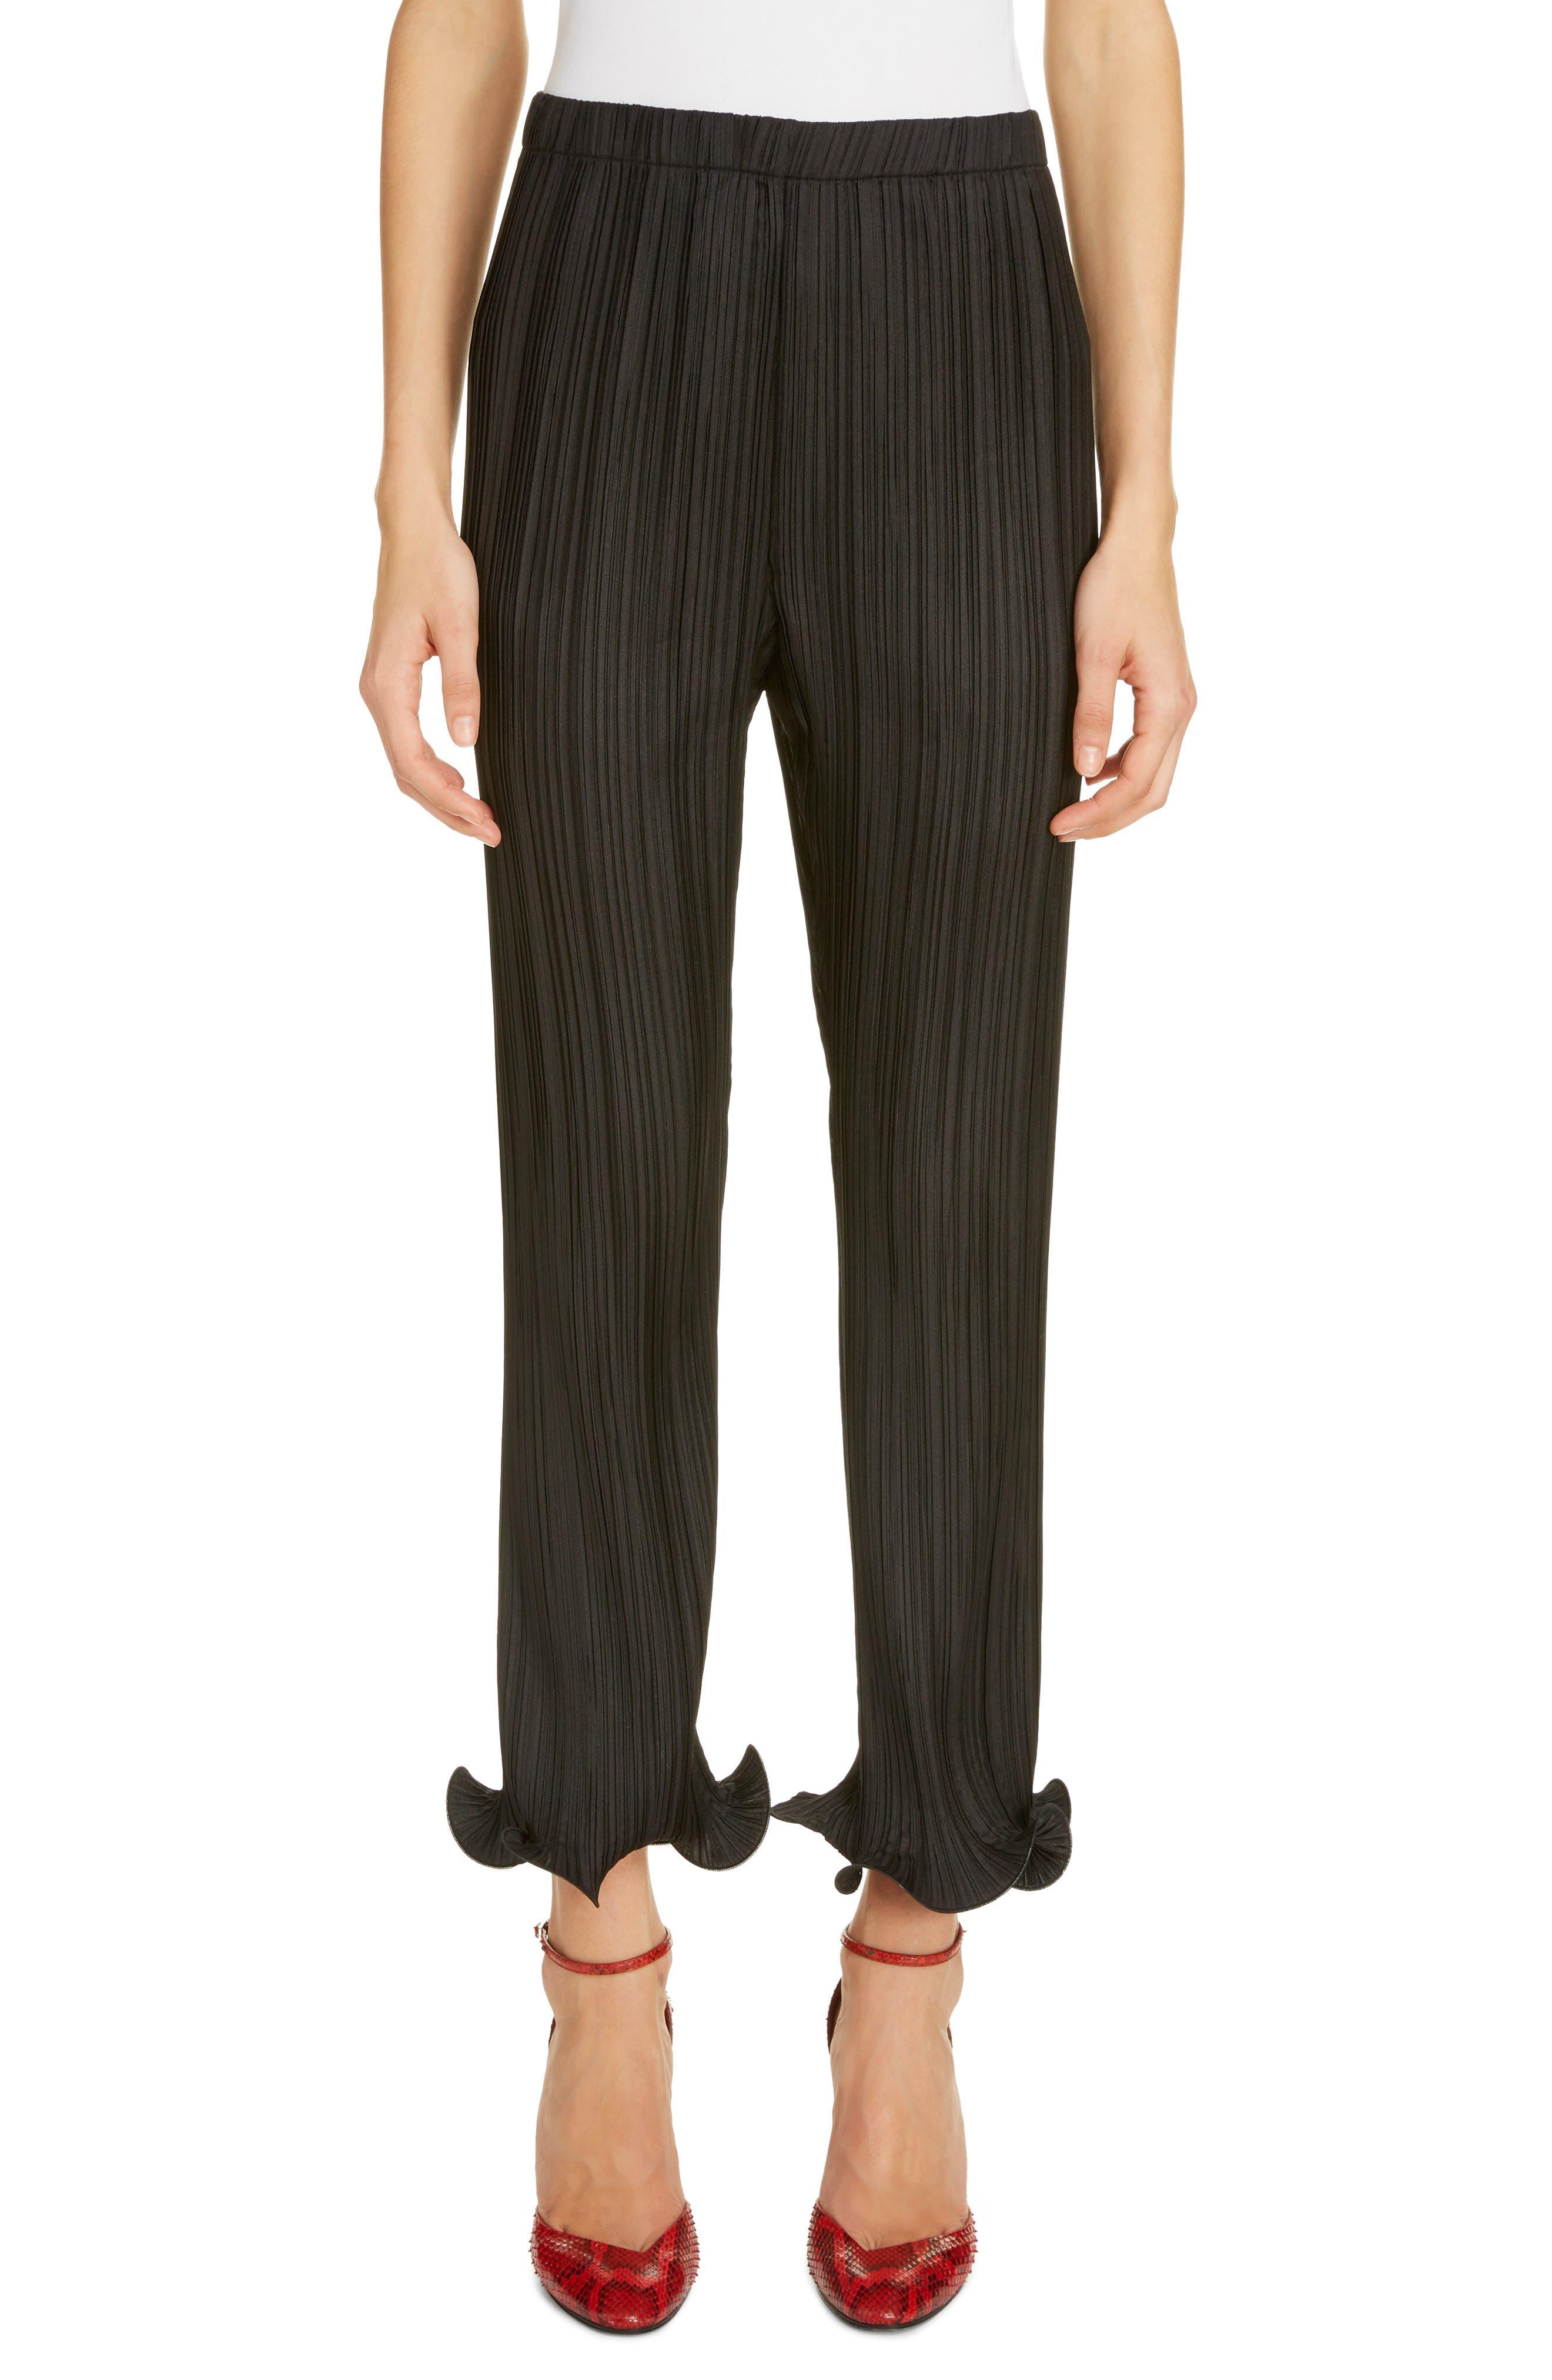 Givenchy Pants Ruffle Cuff Plissé Pants